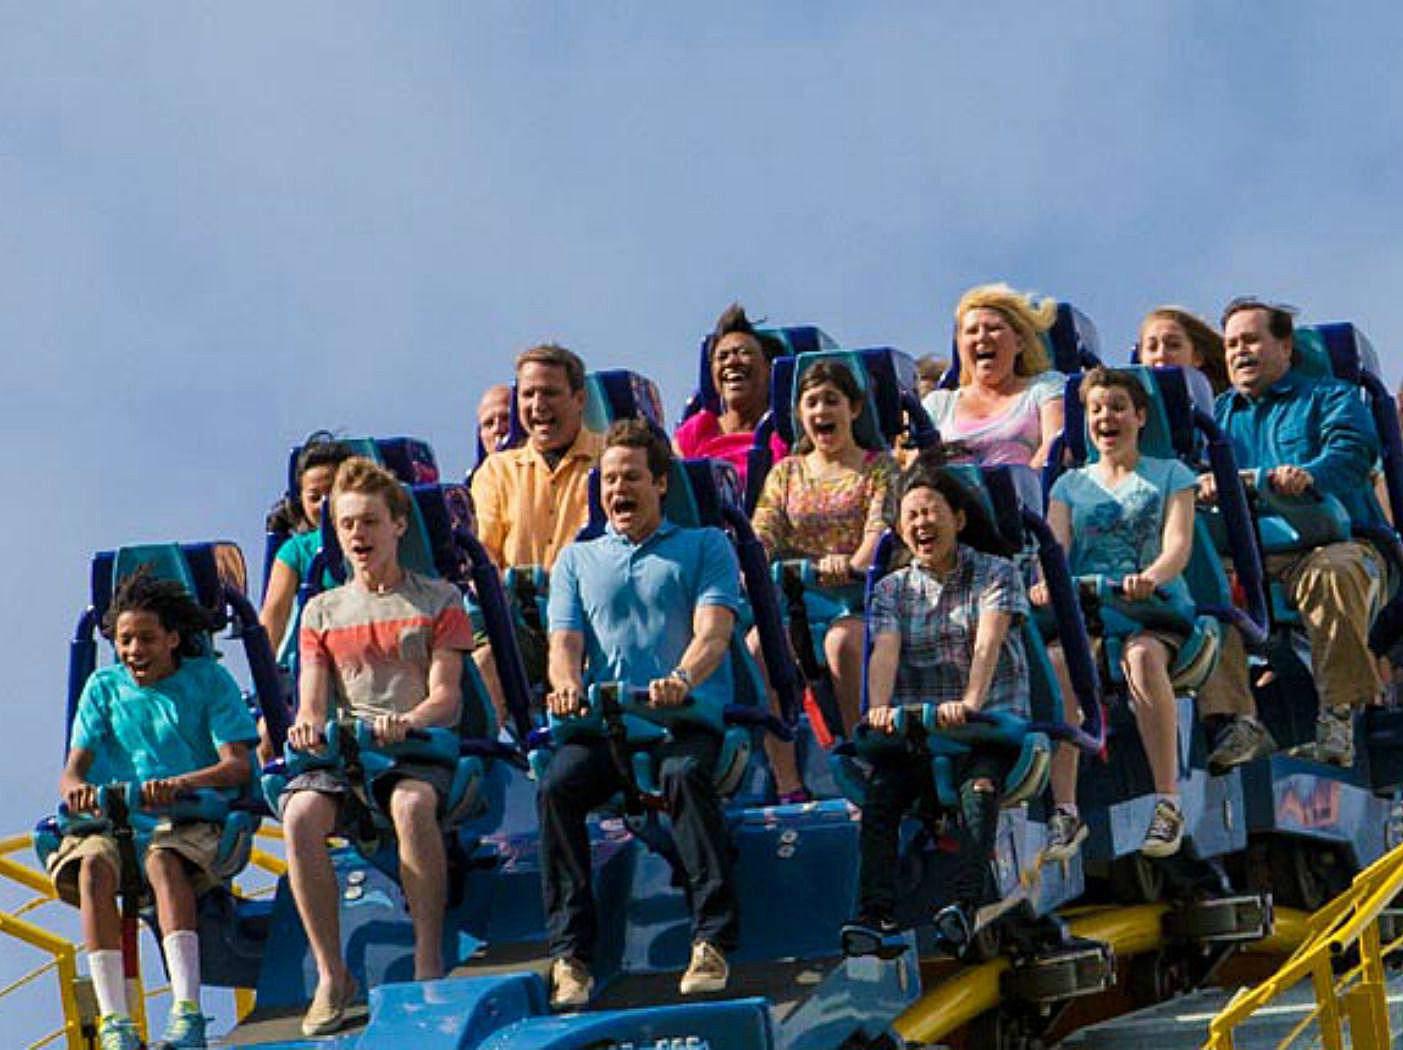 Hershey Park - Skyrush roller coaster